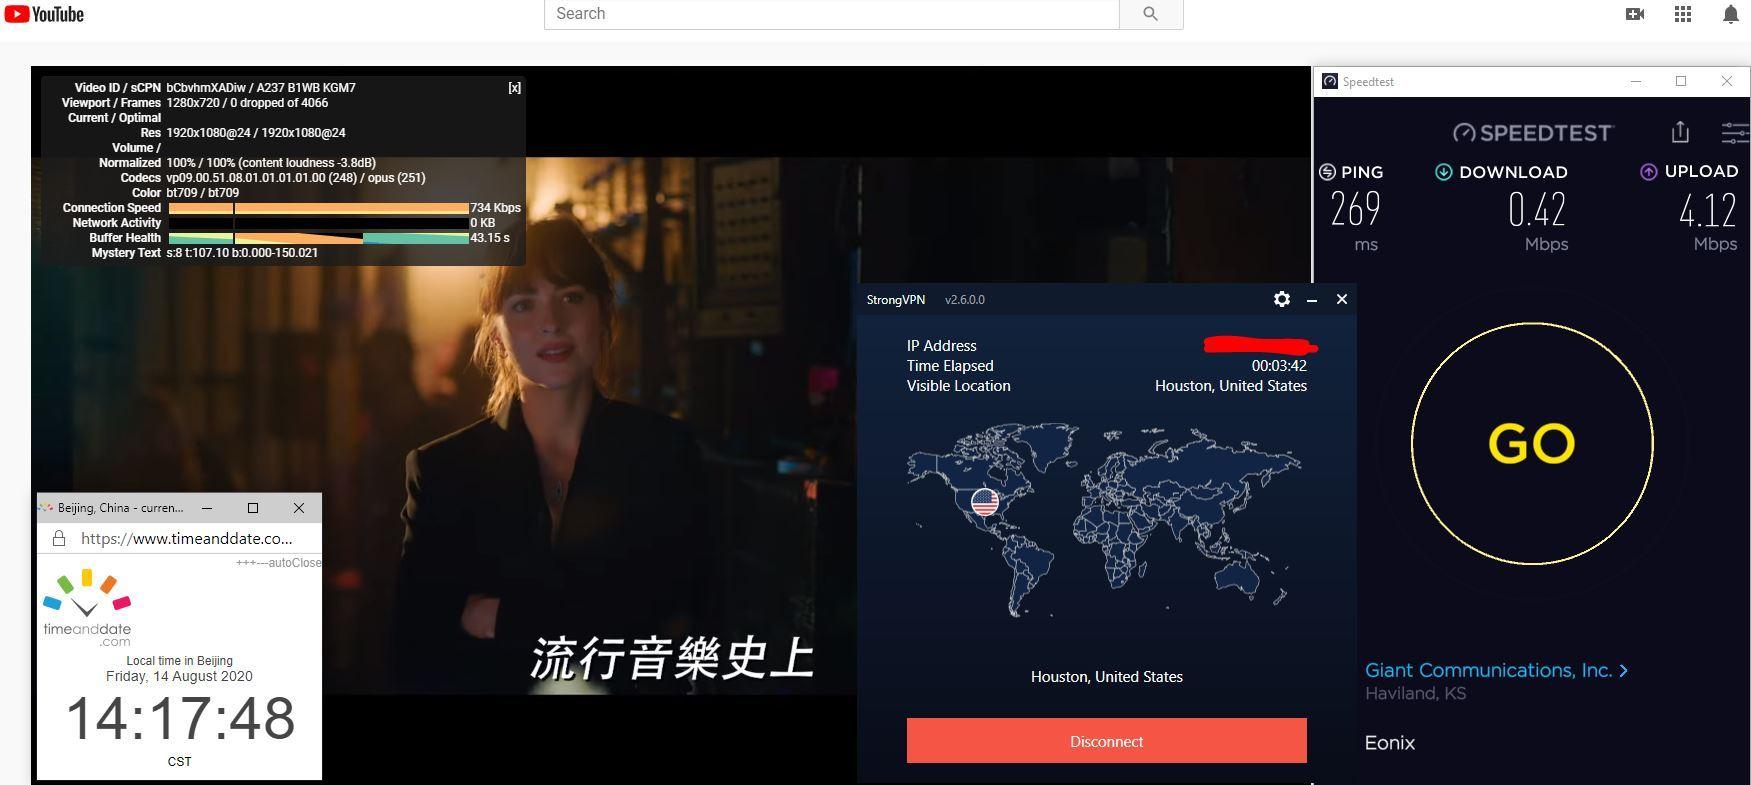 Windows10-StrongVPN-IKEv2-USA-Houston-中国VPN-翻墙-科学上网-翻墙速度测试-20200814.jpg